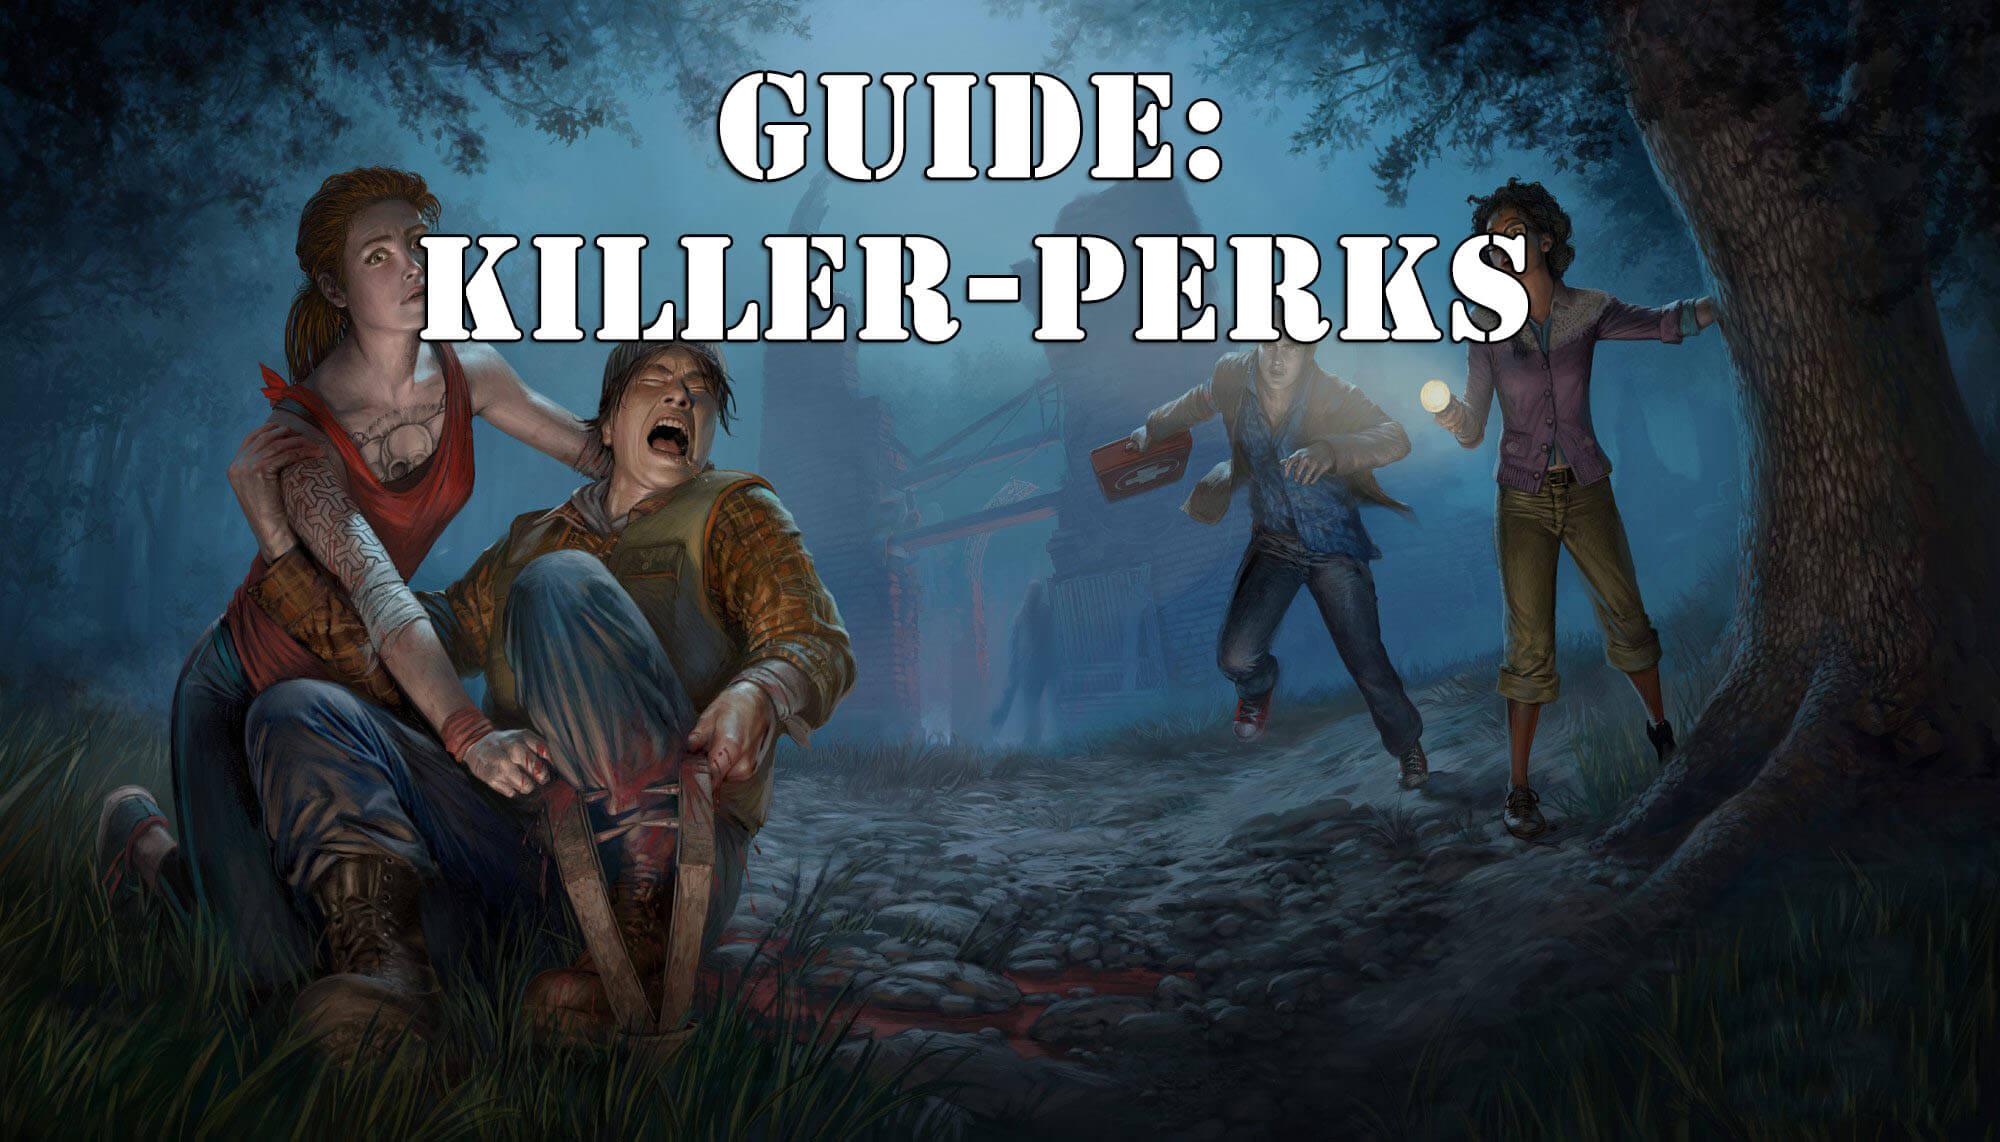 Dead by Daylight: Killer-Perk Guide – Das können die Perks des Killer